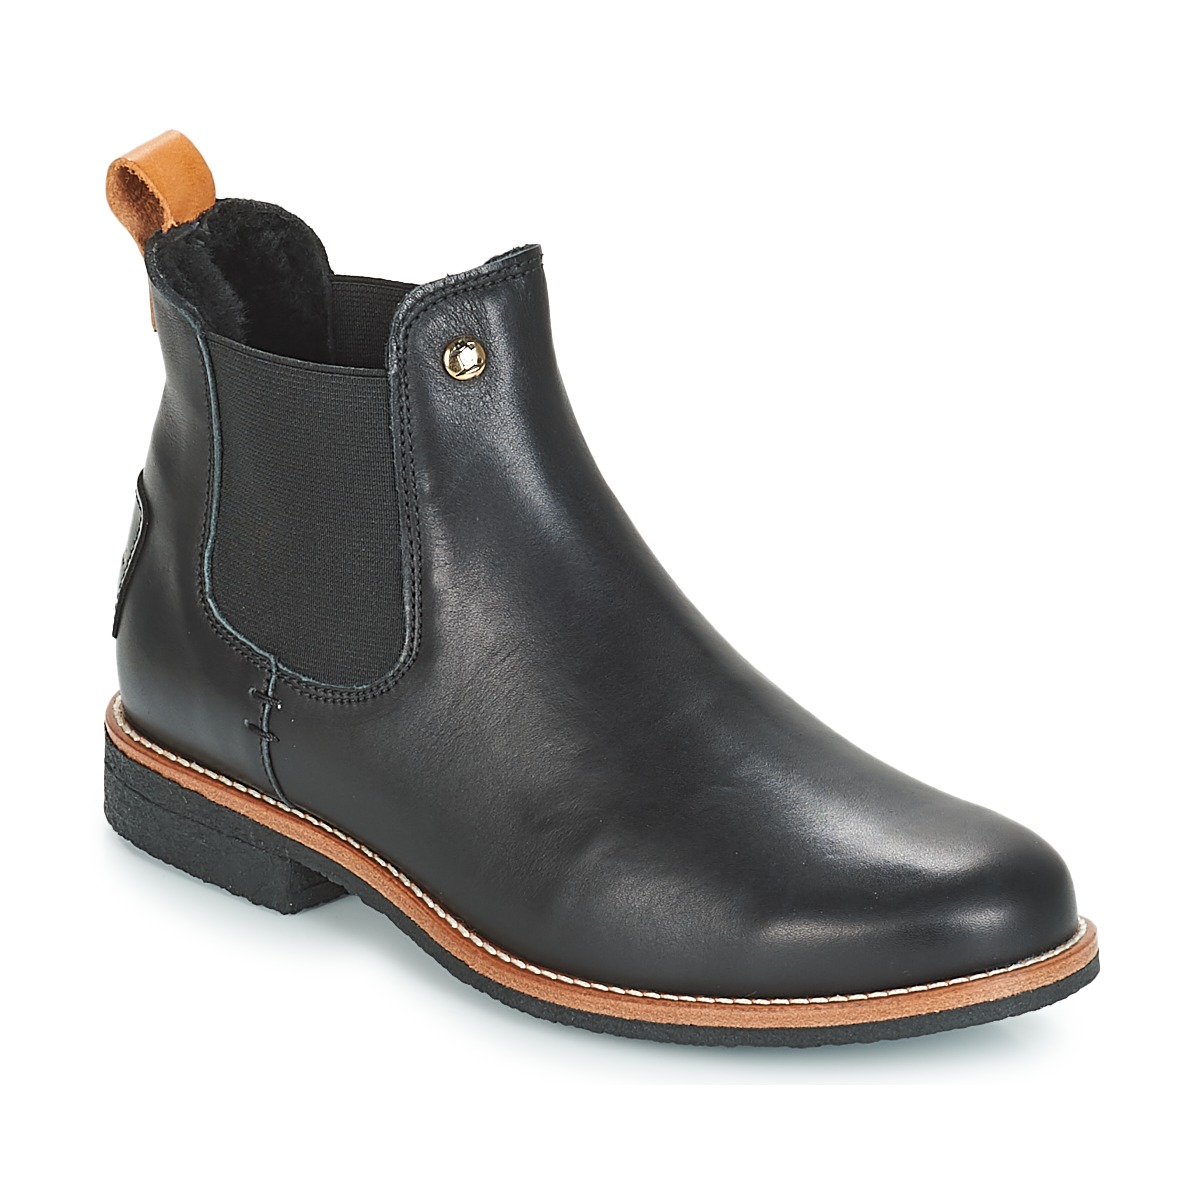 Støvler Panama Jack  GIORDANA